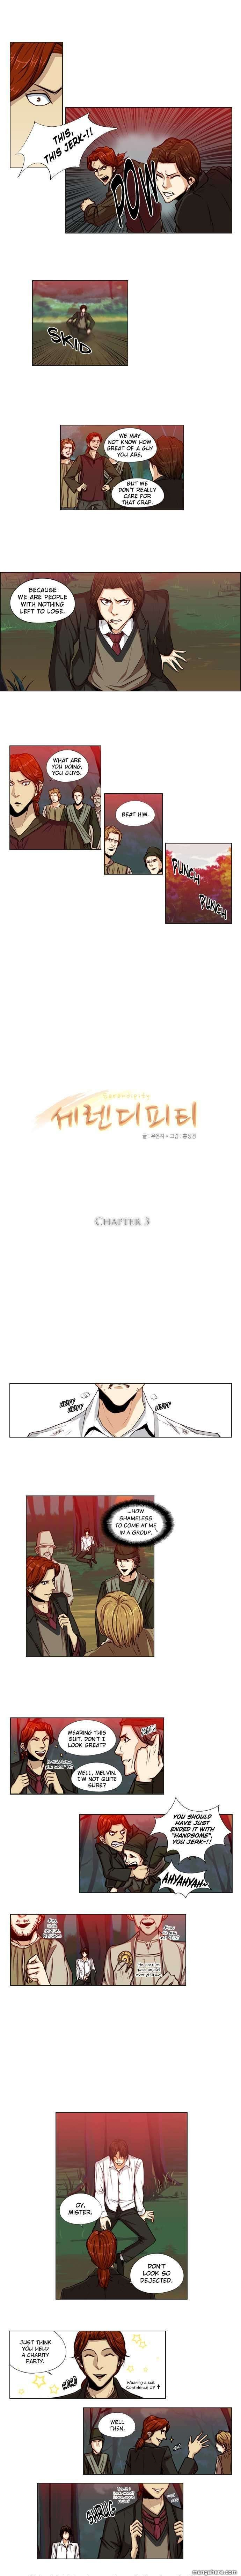 Serendipity 3 Page 2